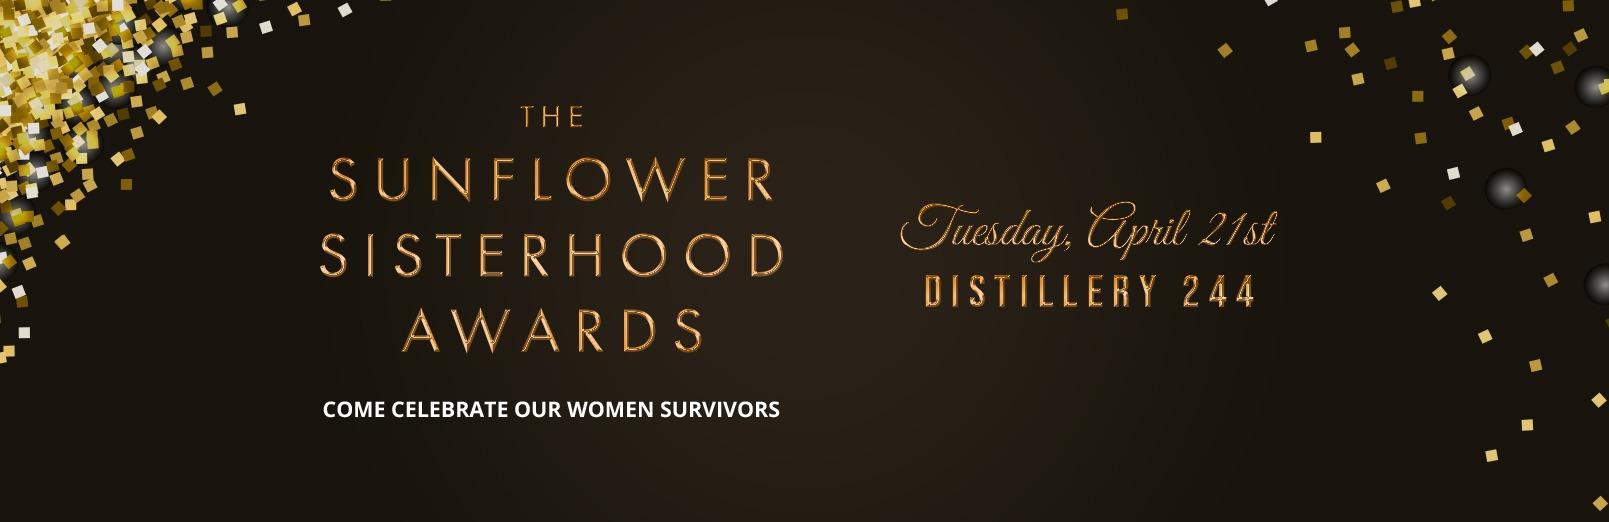 Sunflower Sisterhood Awards 2020